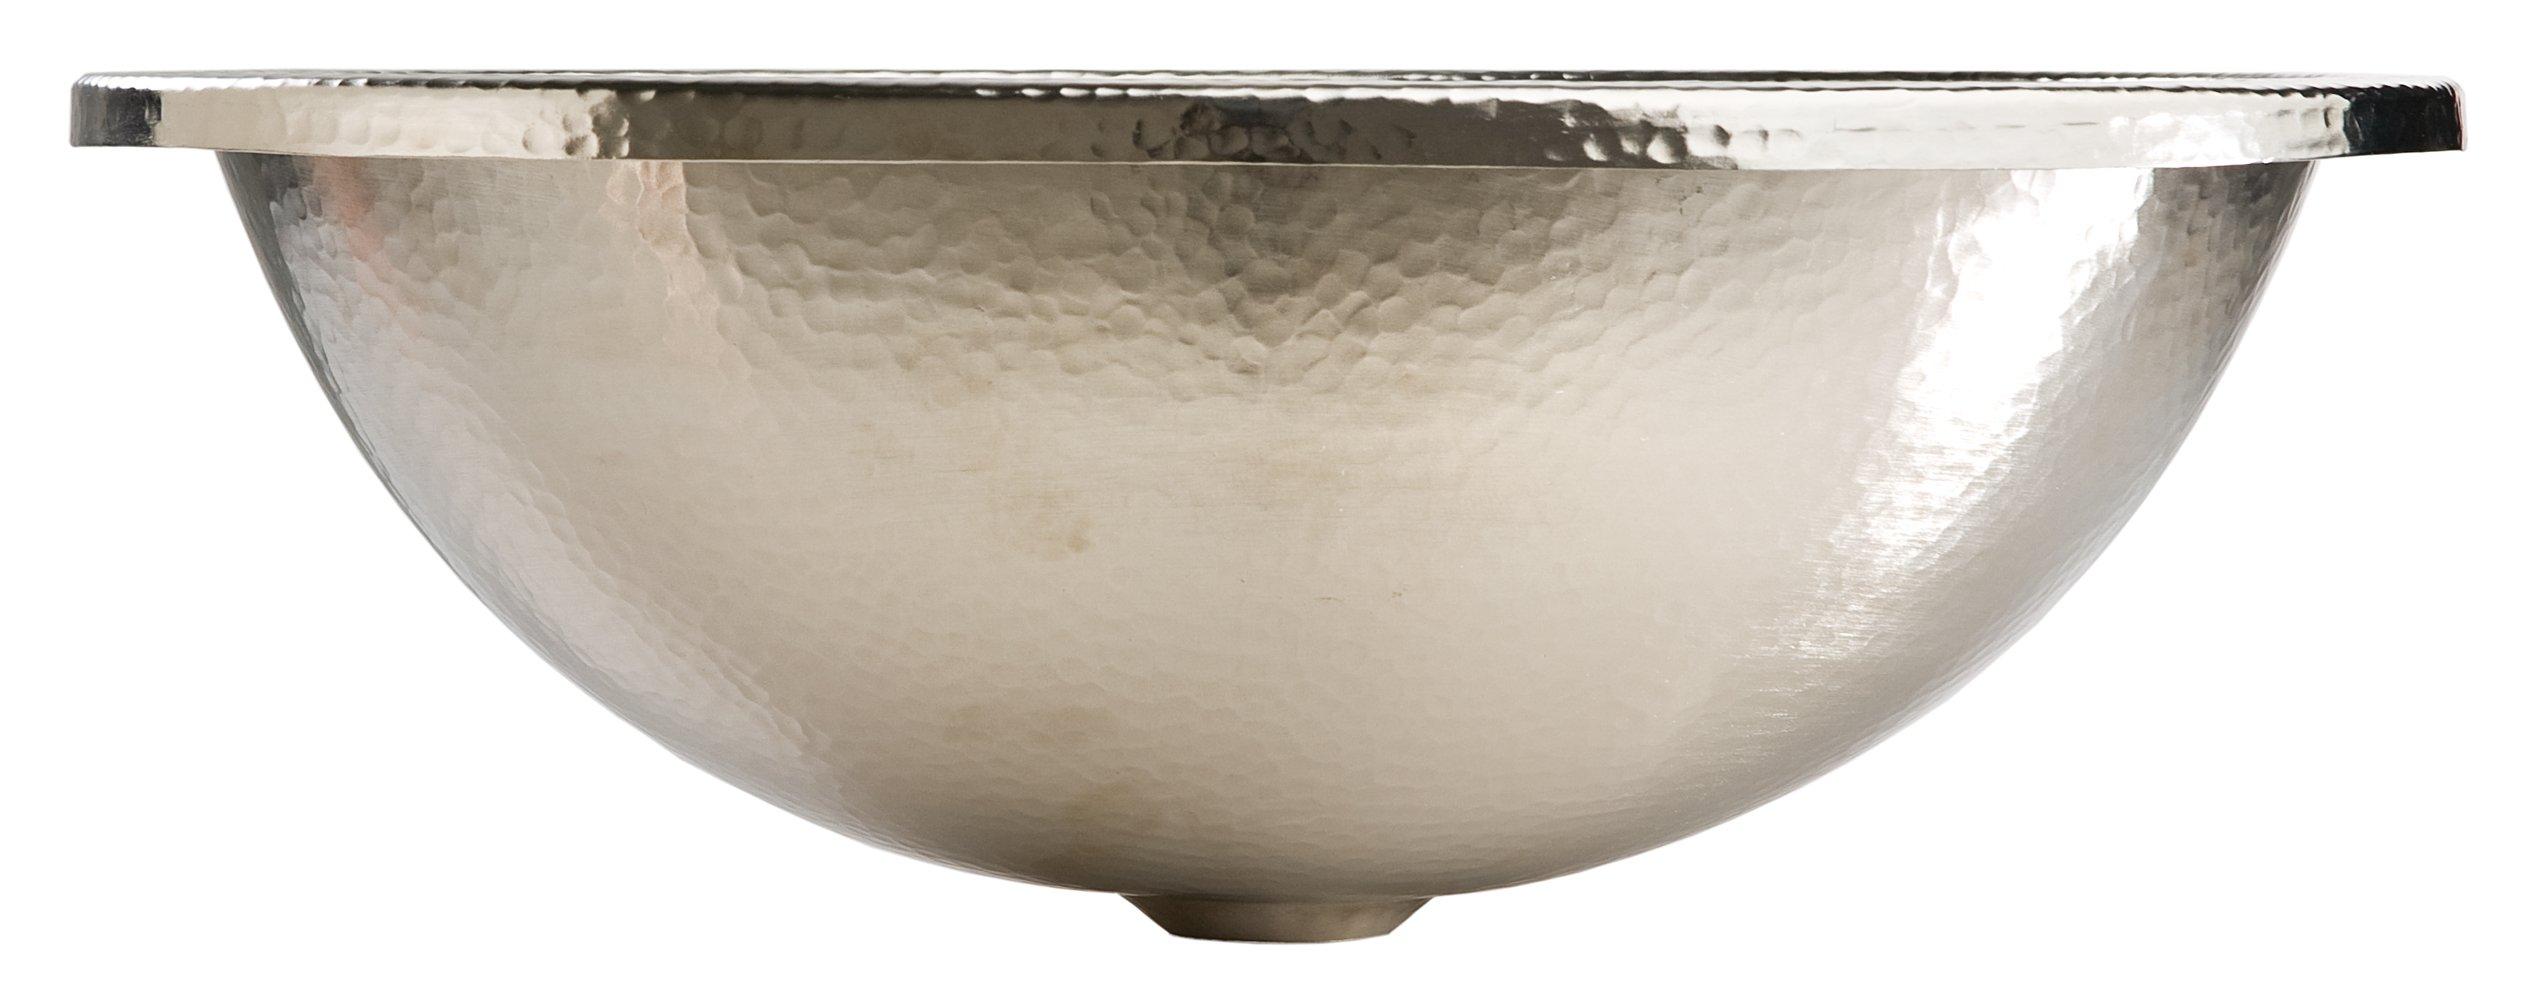 Sinkology SB203-18N Edison Dual Mount Oval Bathroom Sink, 18-0.5 Inch, Hammered Nickel by Sinkology (Image #2)